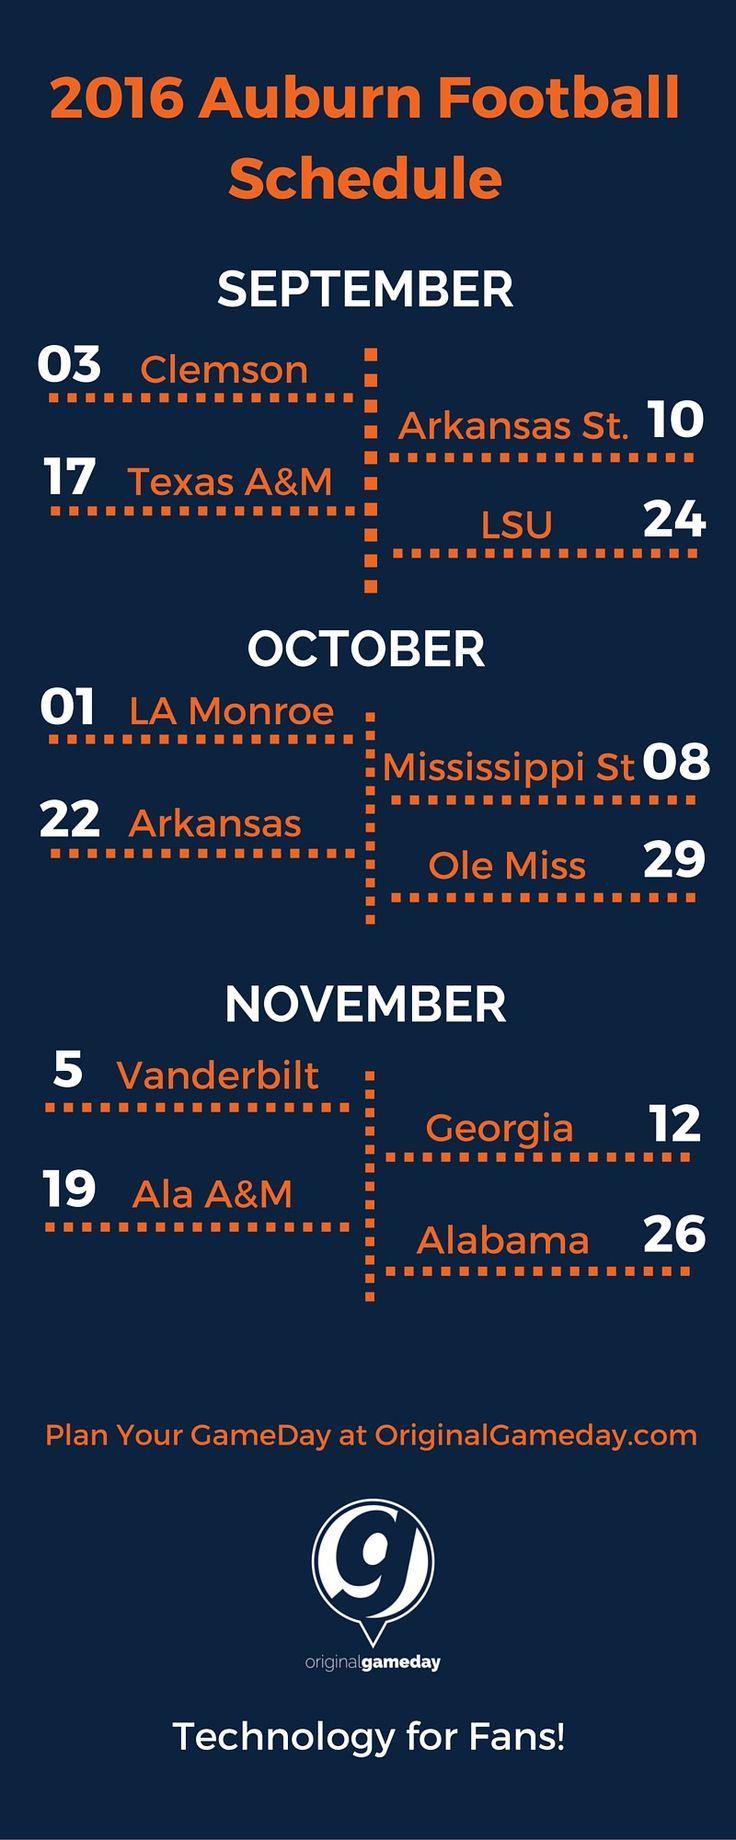 2016 Auburn Football Schedule